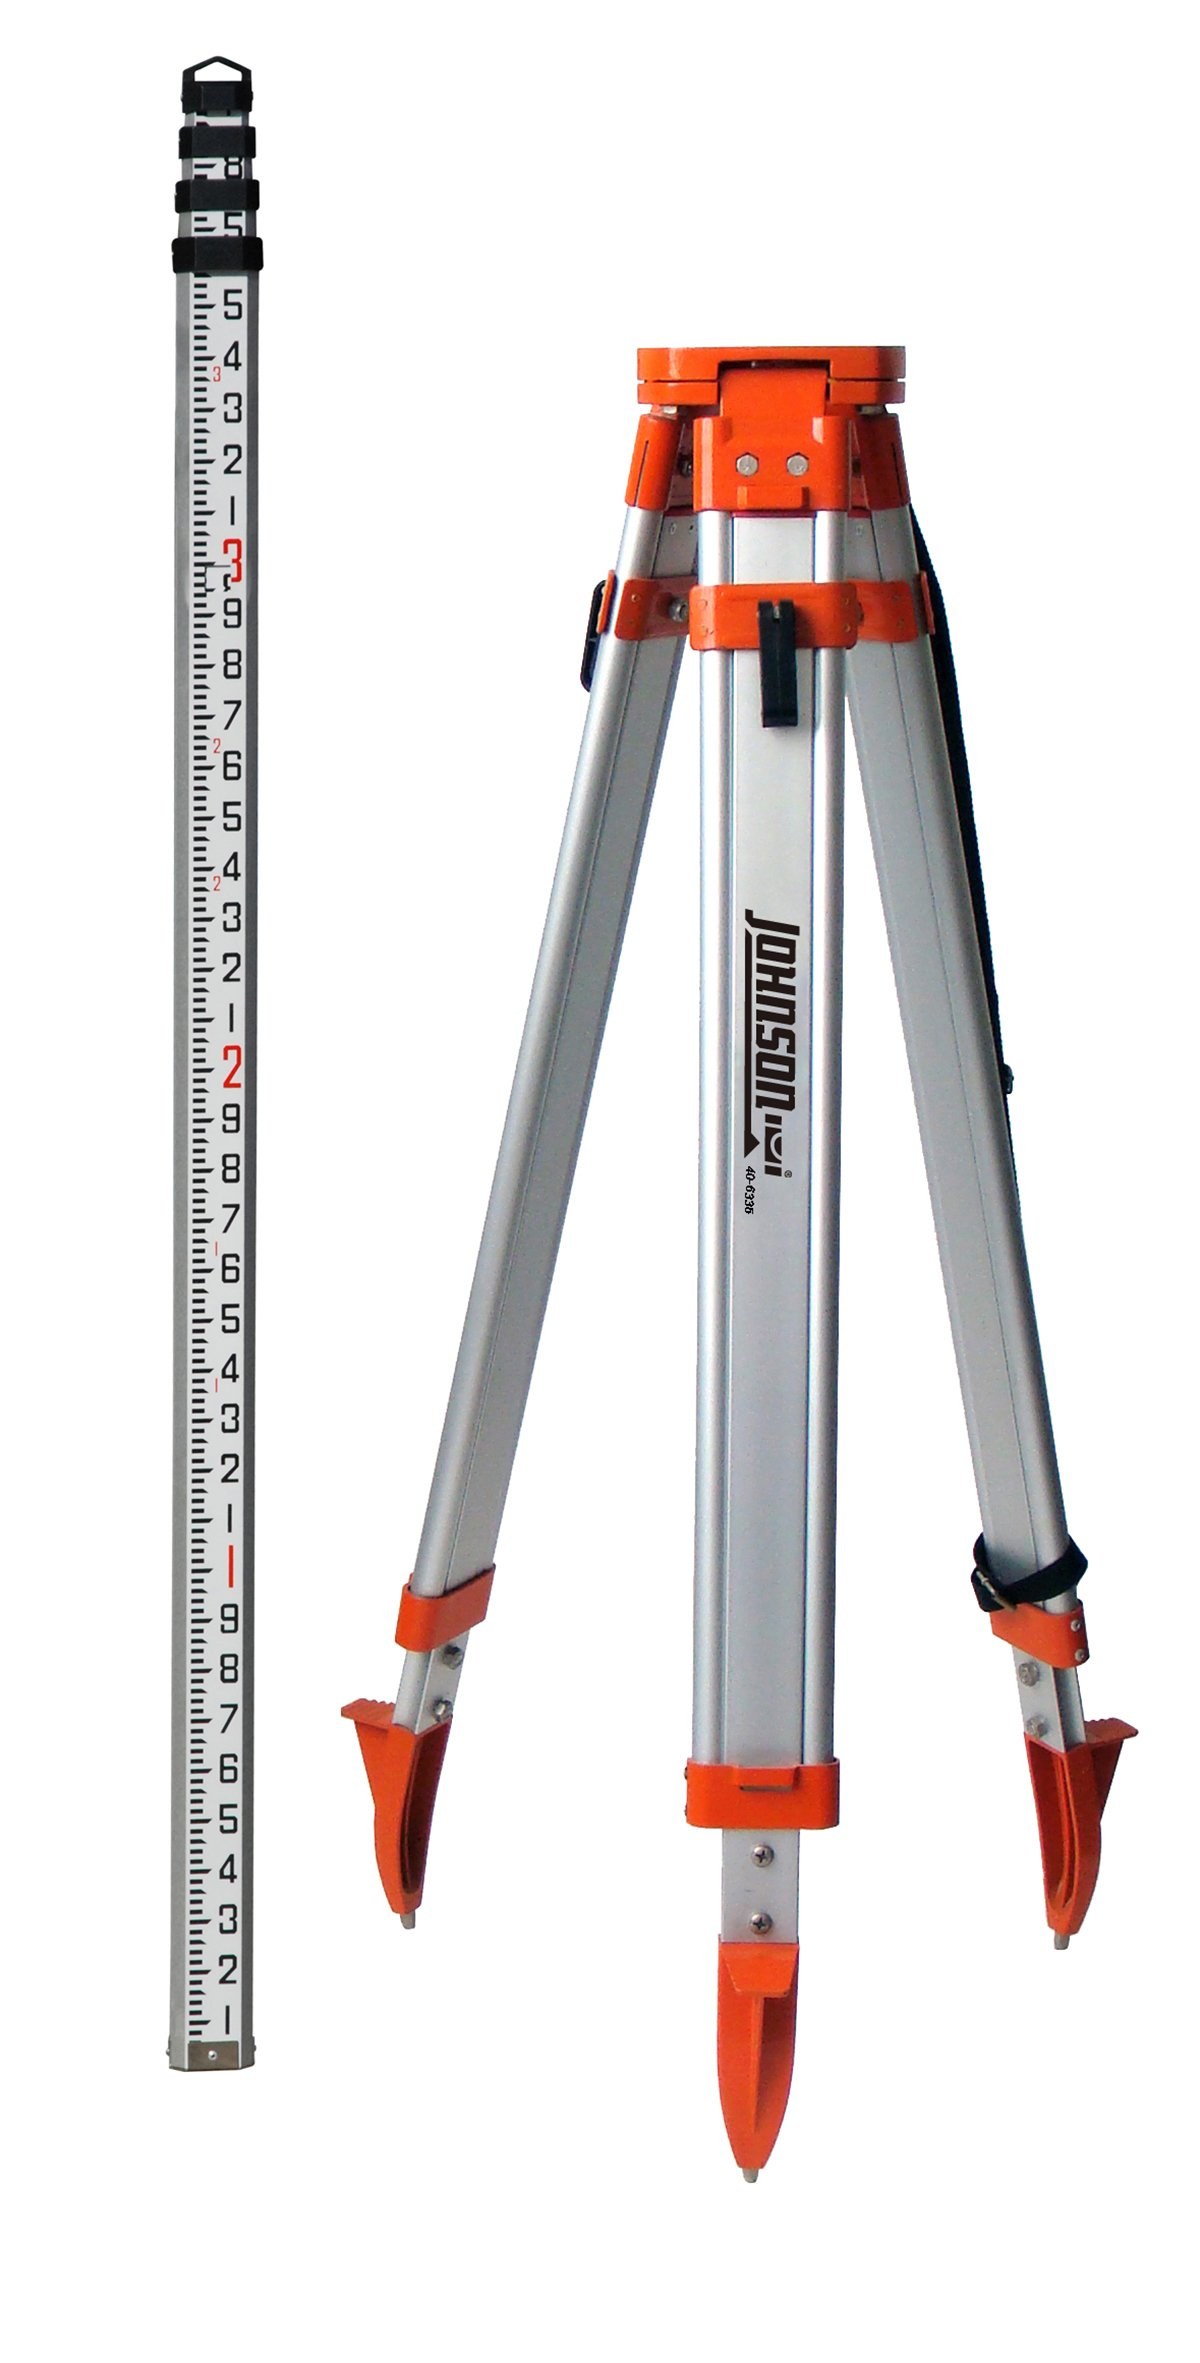 Johnson Level and Tool 40-6350 Universal Tripod Kit